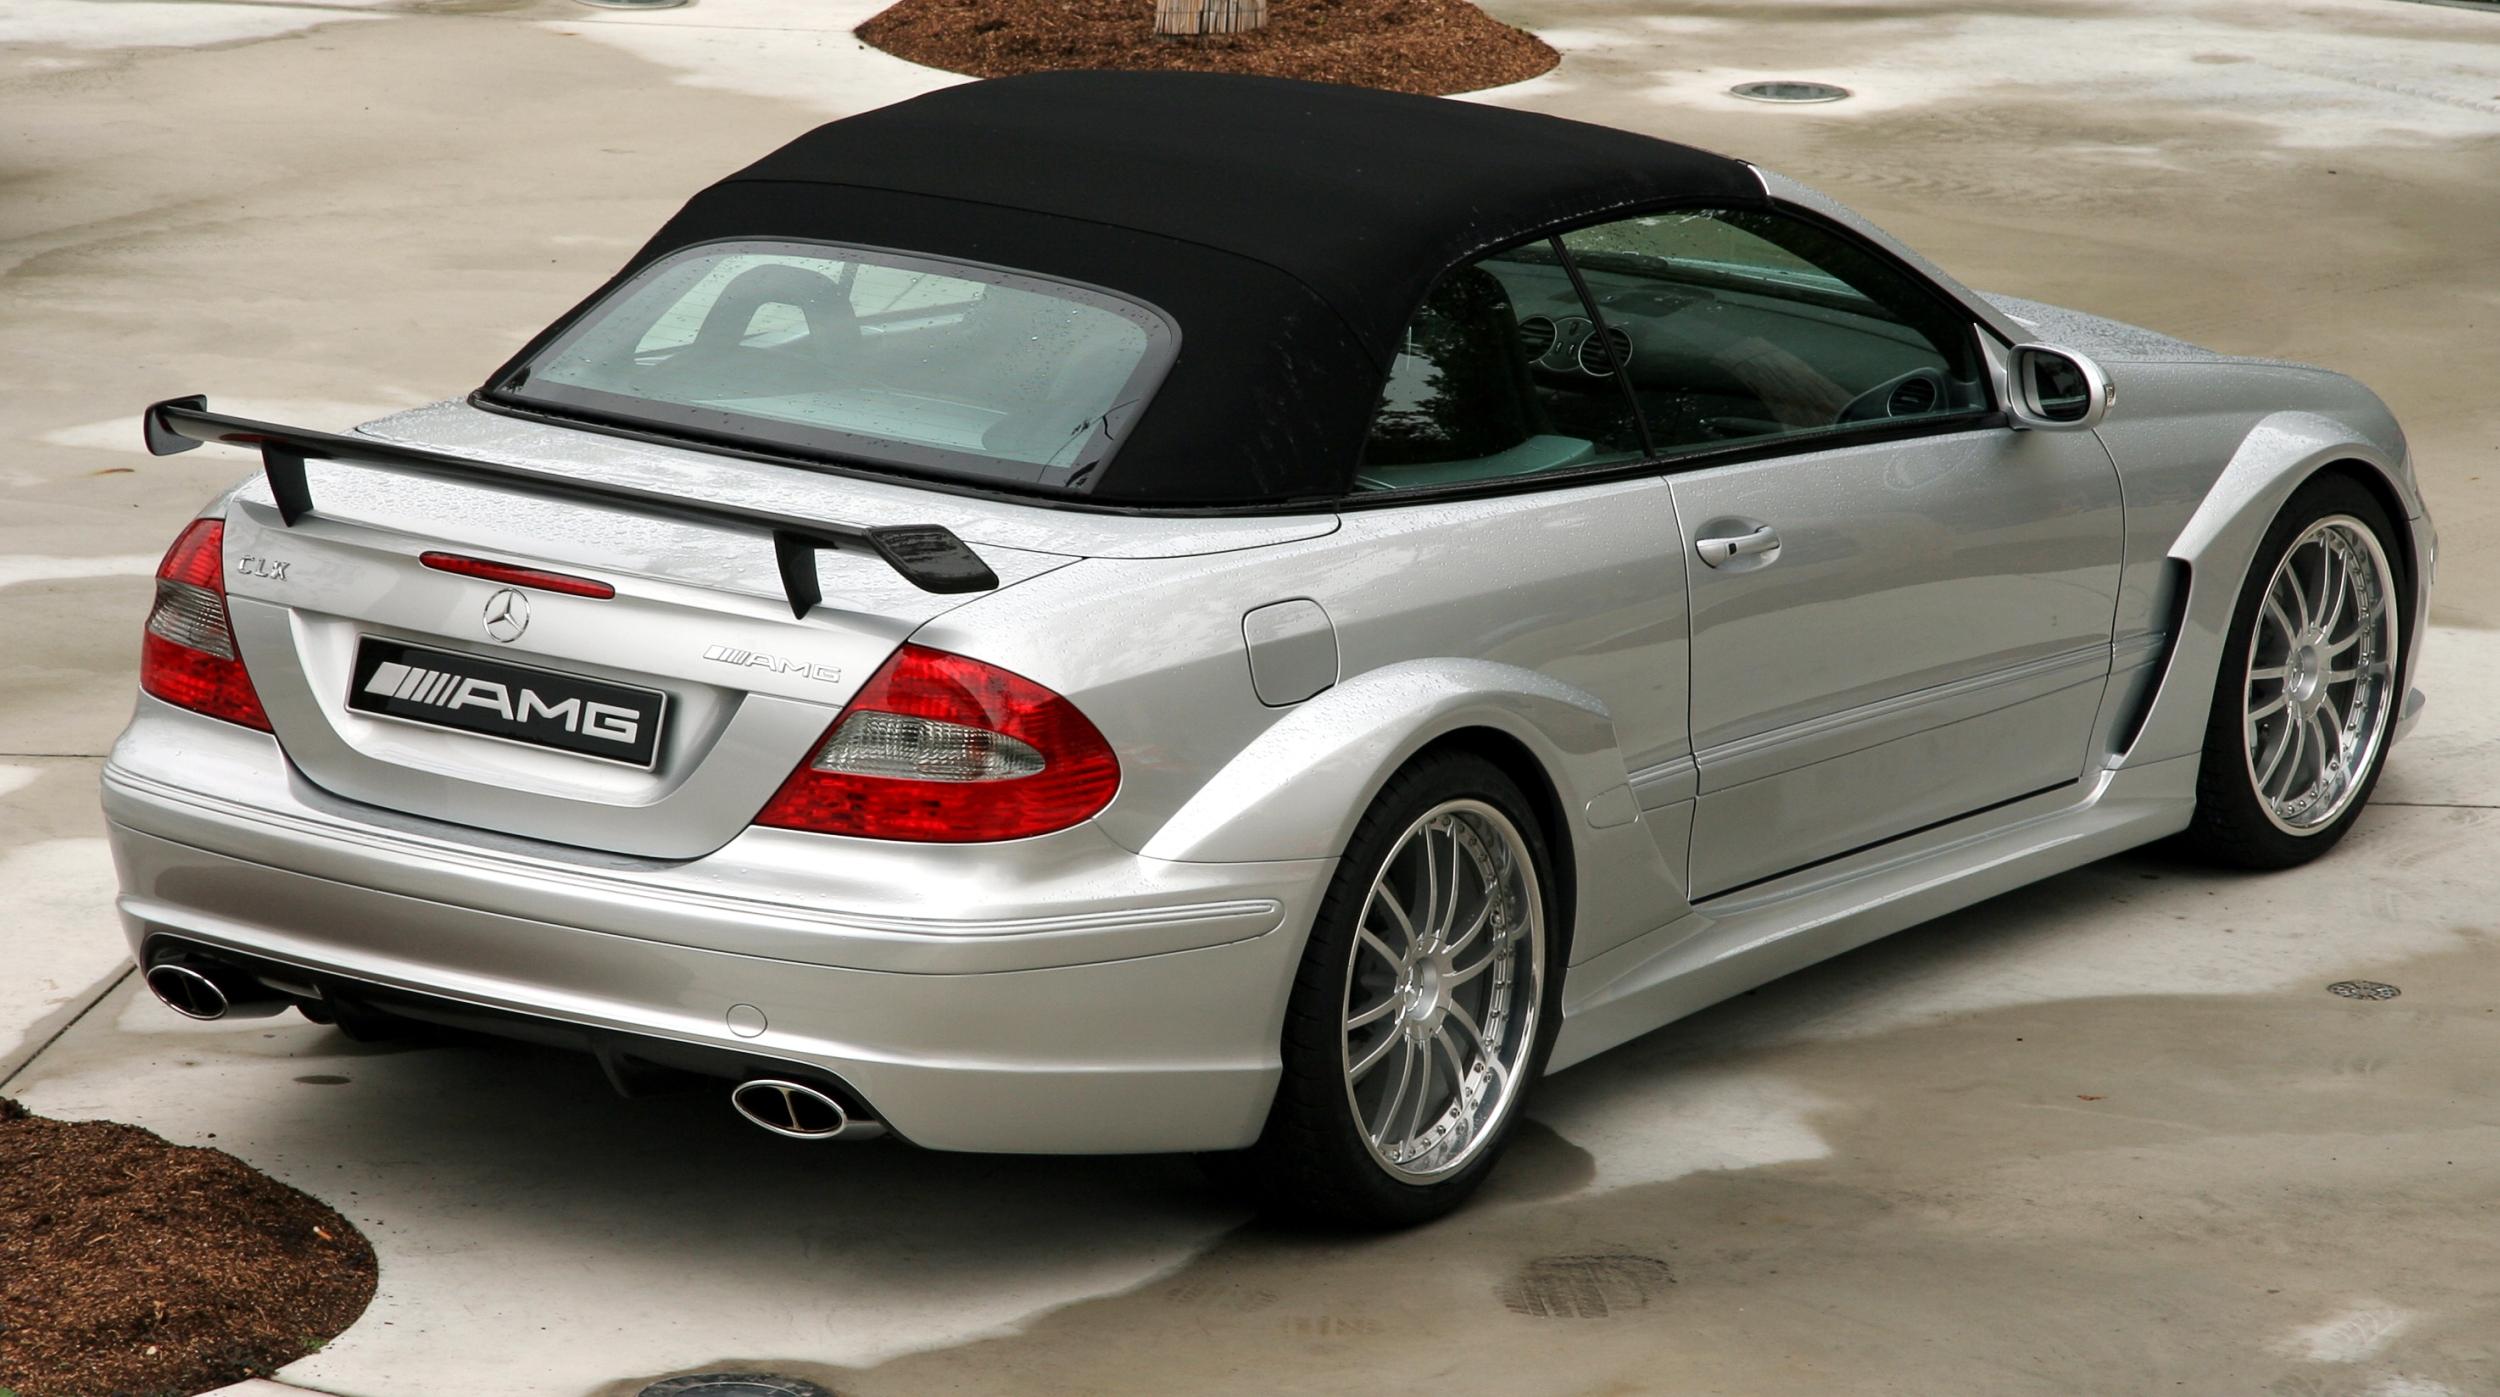 Mercedes Benz Clk Black Edition For Sale